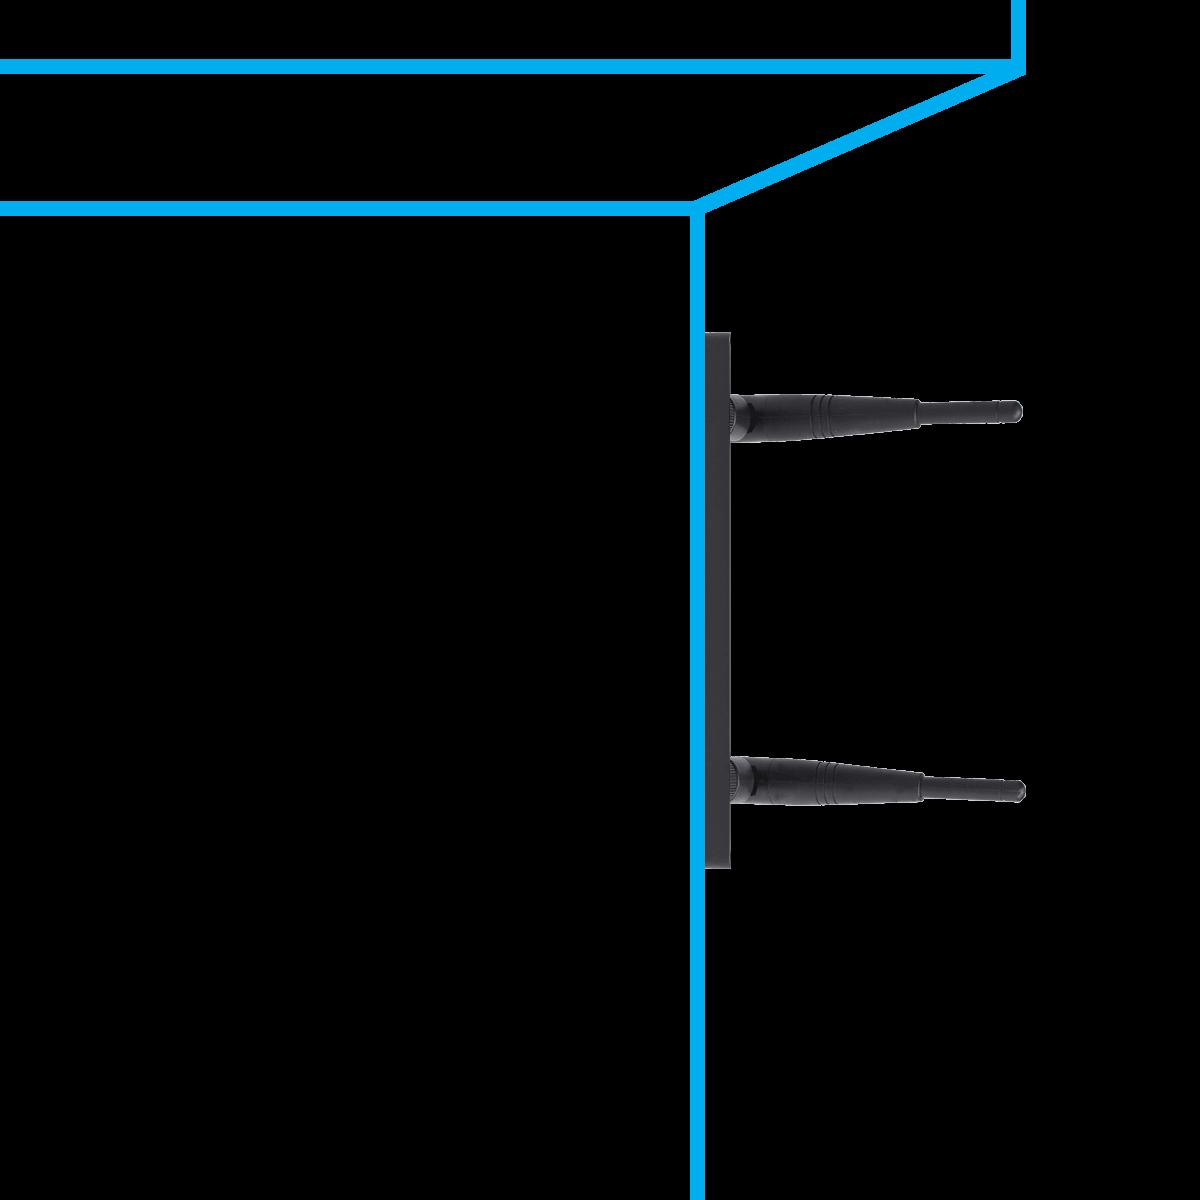 weatherproof wire-free receiver